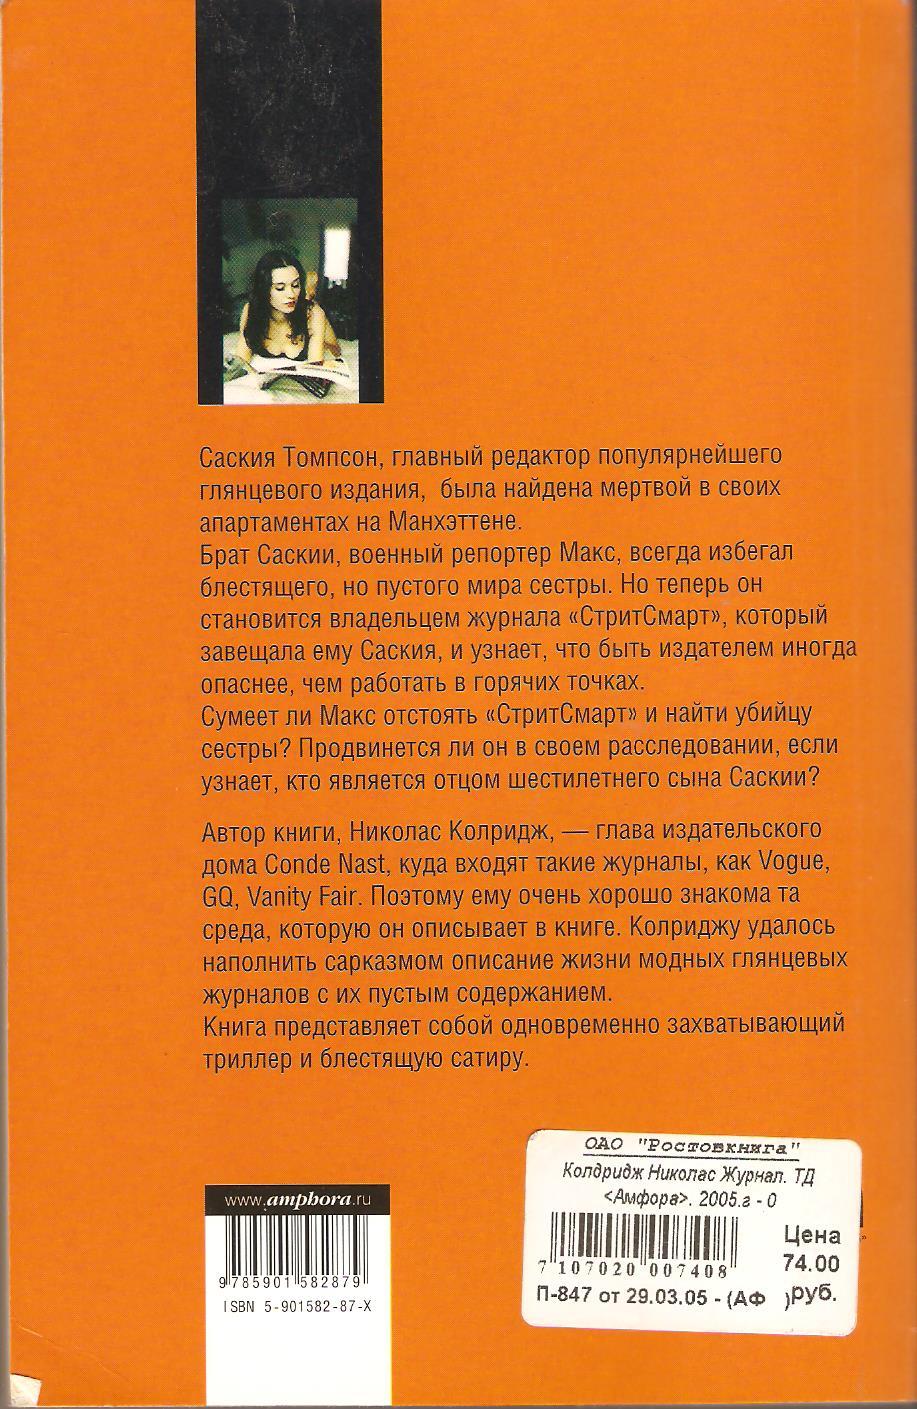 Н. Колридж. Журнал 002.jpg